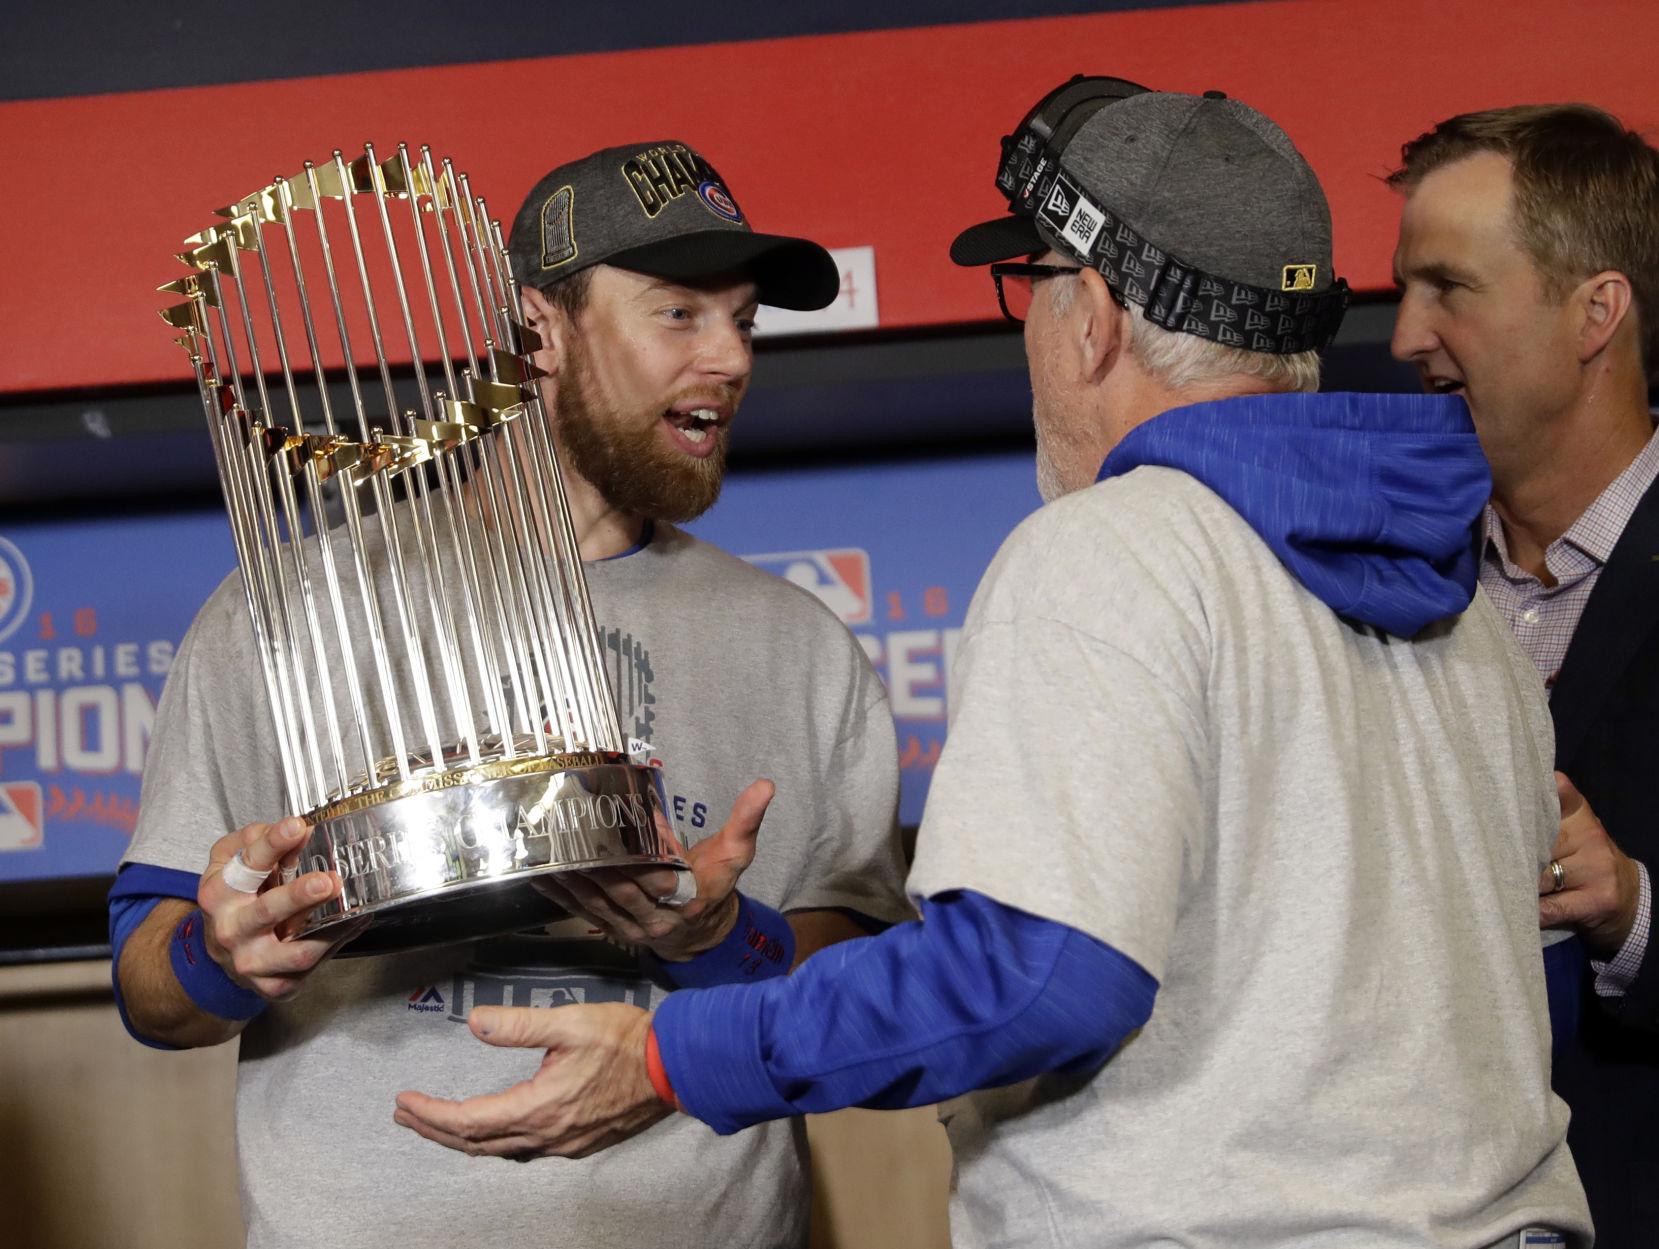 world series great photos from game 7 baseball pantagraph com rh pantagraph com